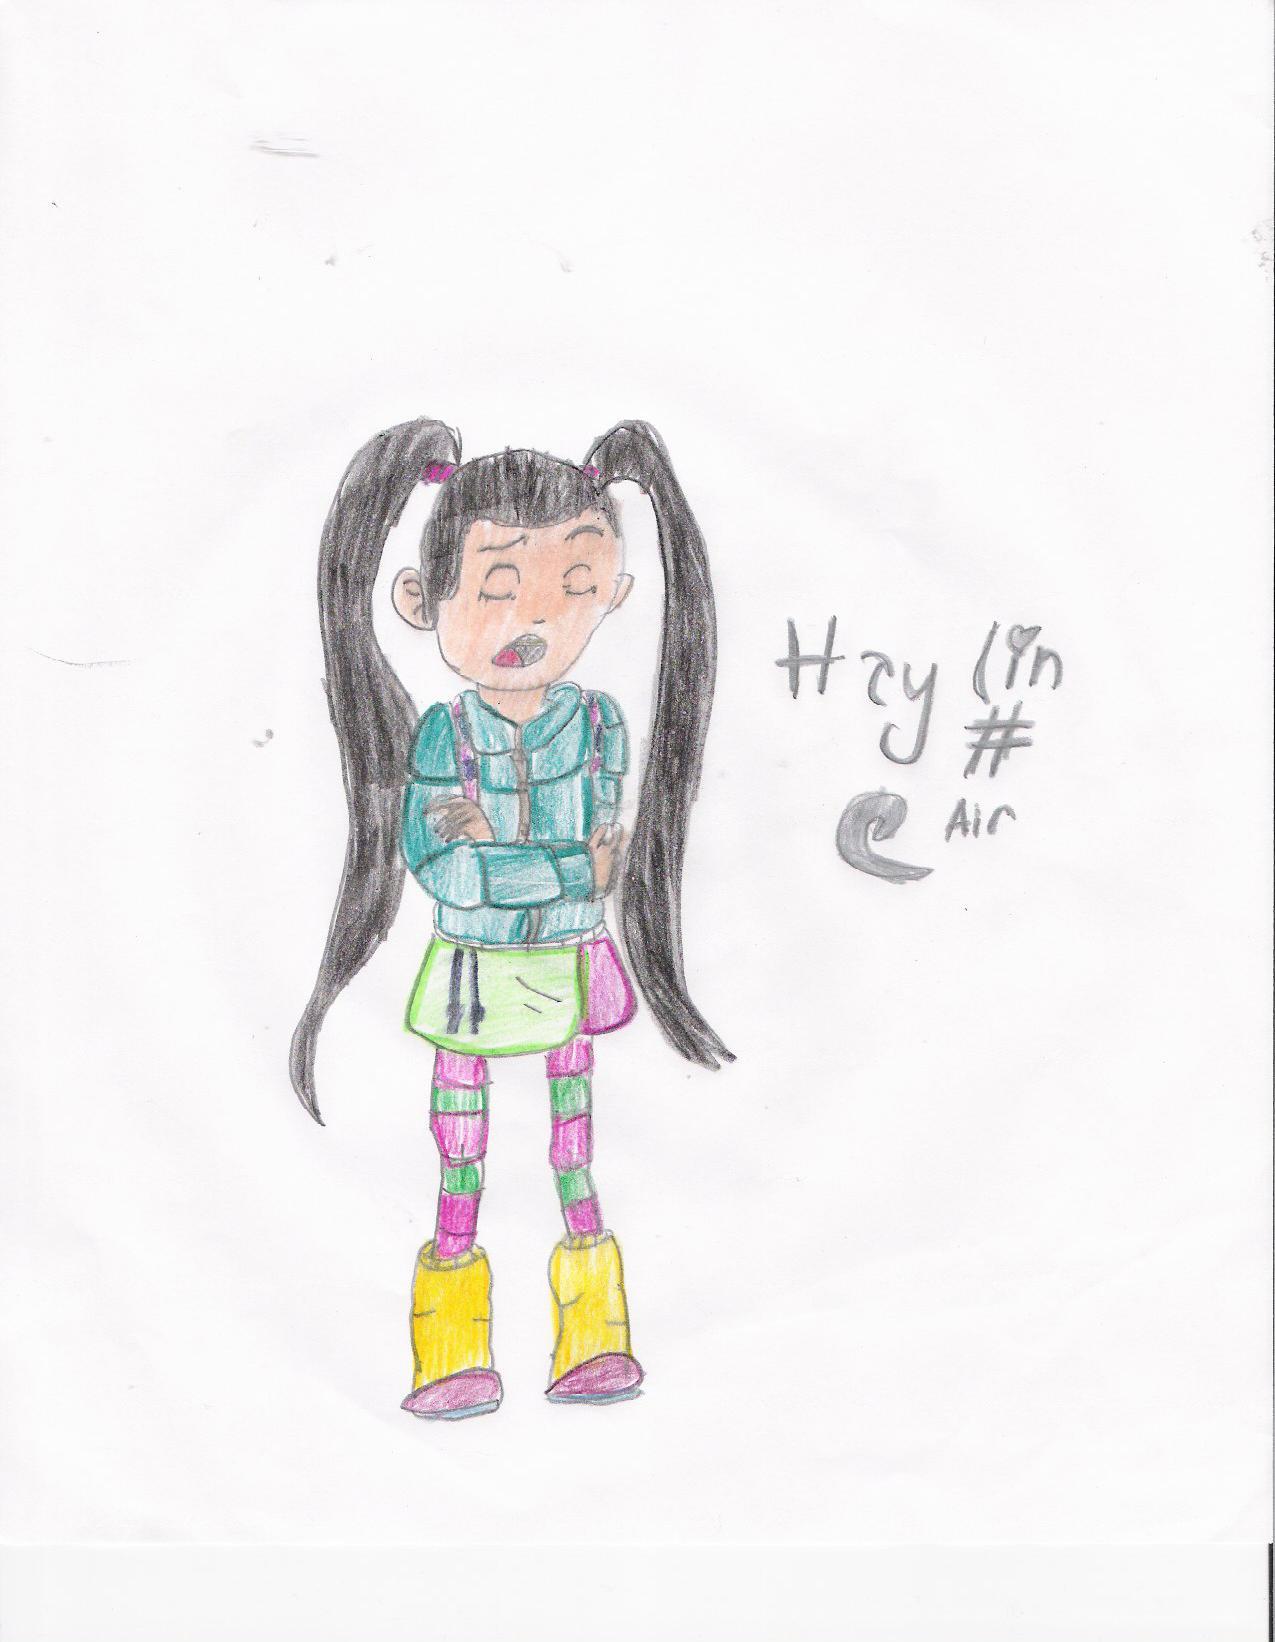 Hay Lin by tipsygirl945